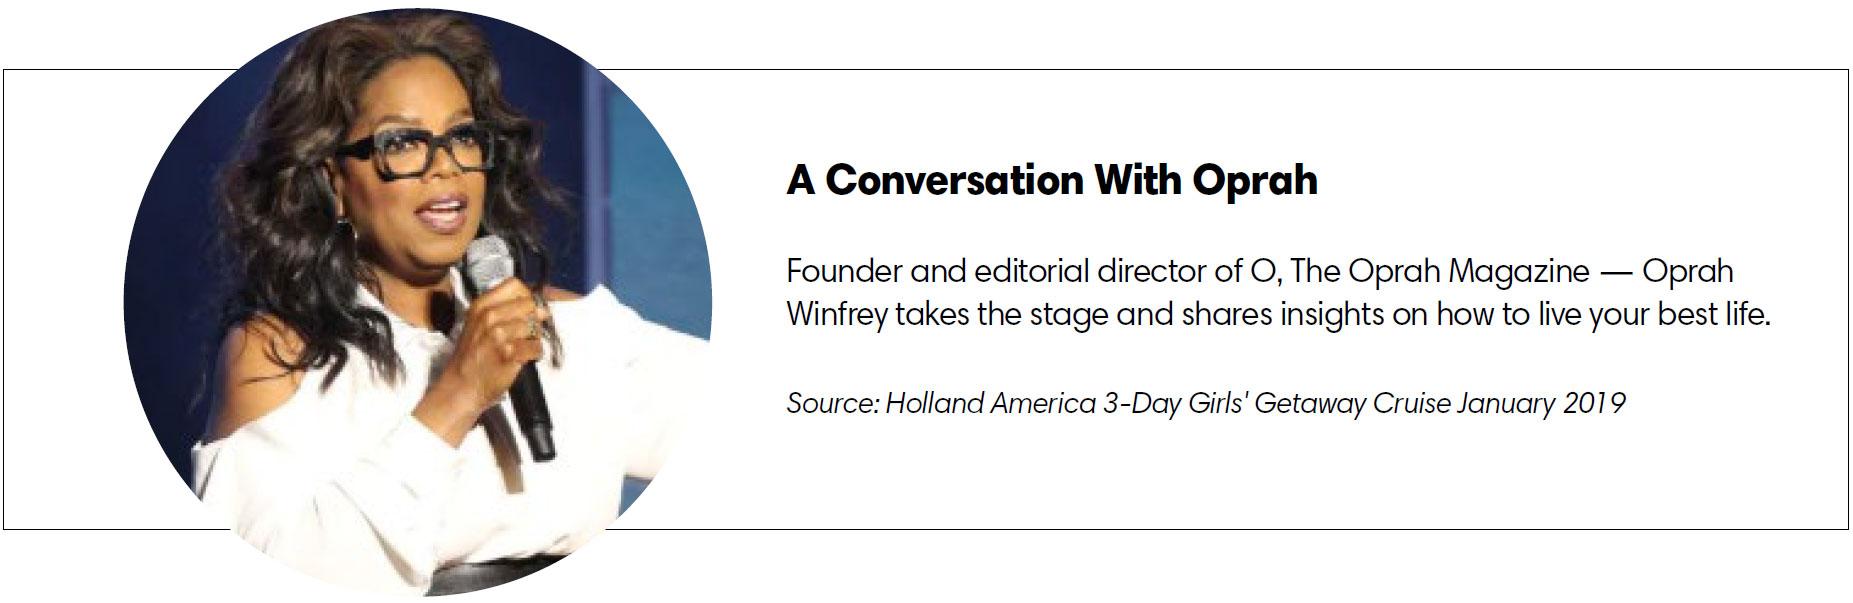 A conversation with Oprah